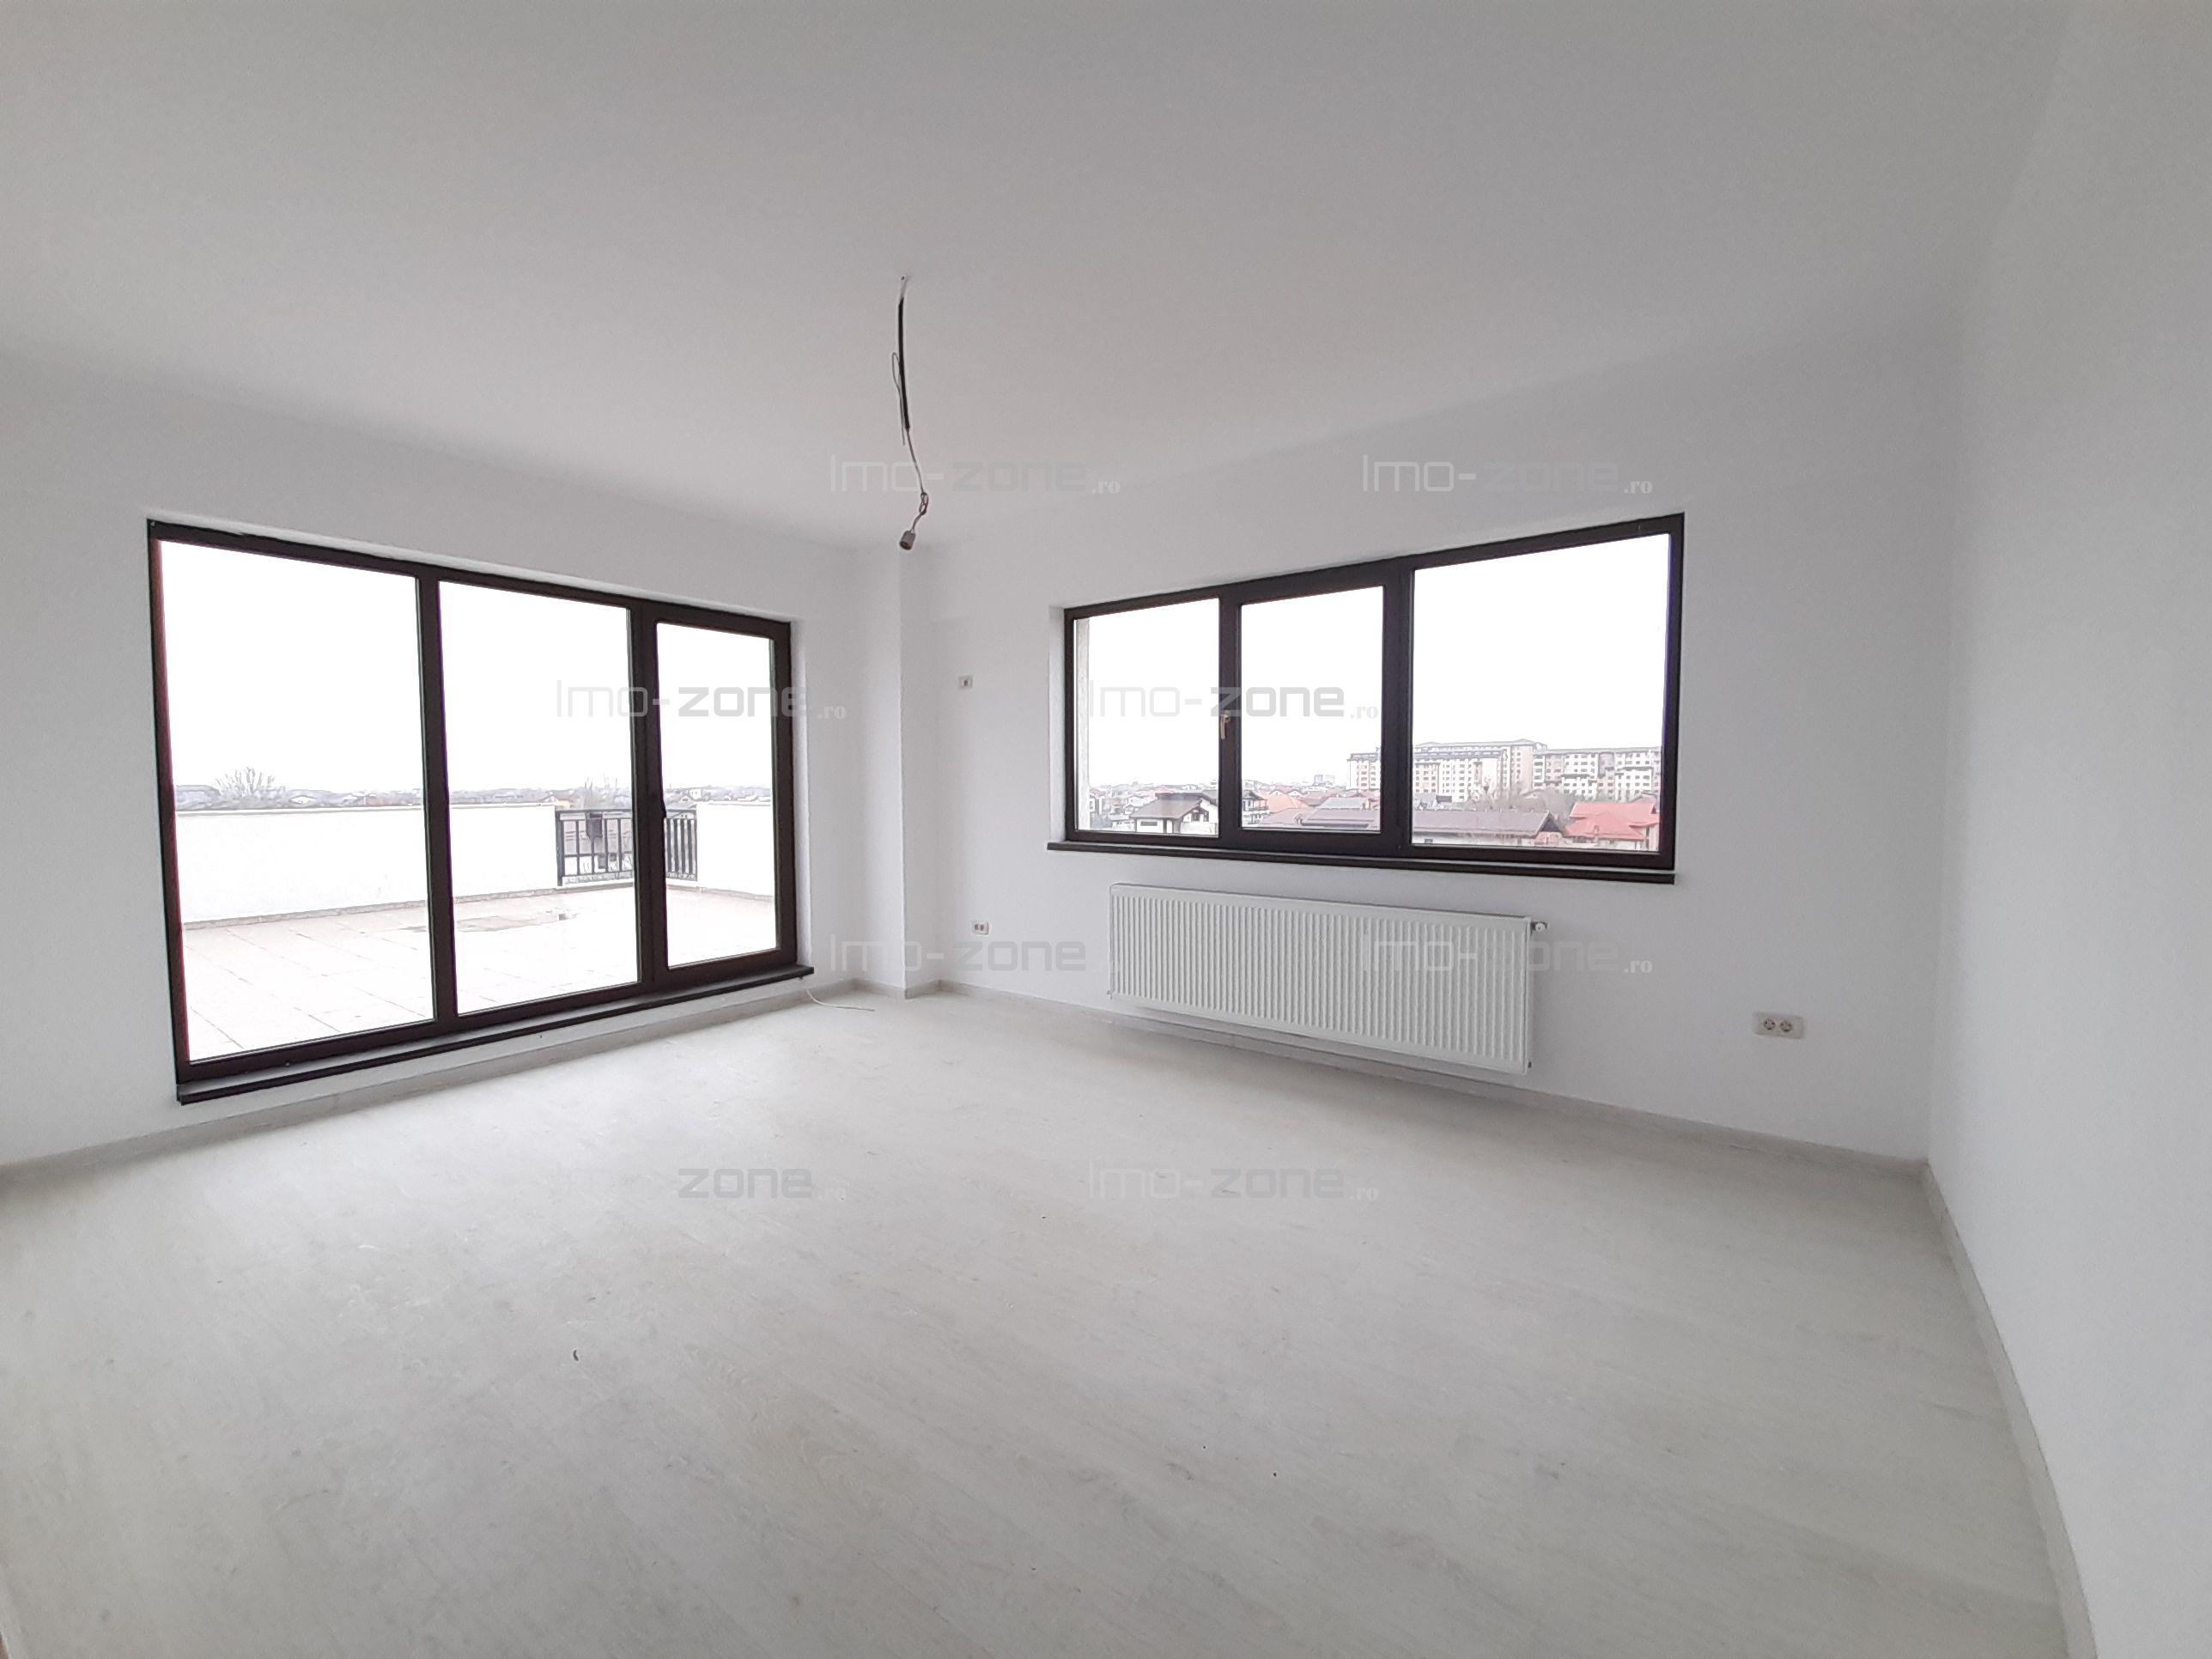 Apartament 3 camere, 112 mp(terasa 42 mp), Drumul Taberei, sector 5, finalizat